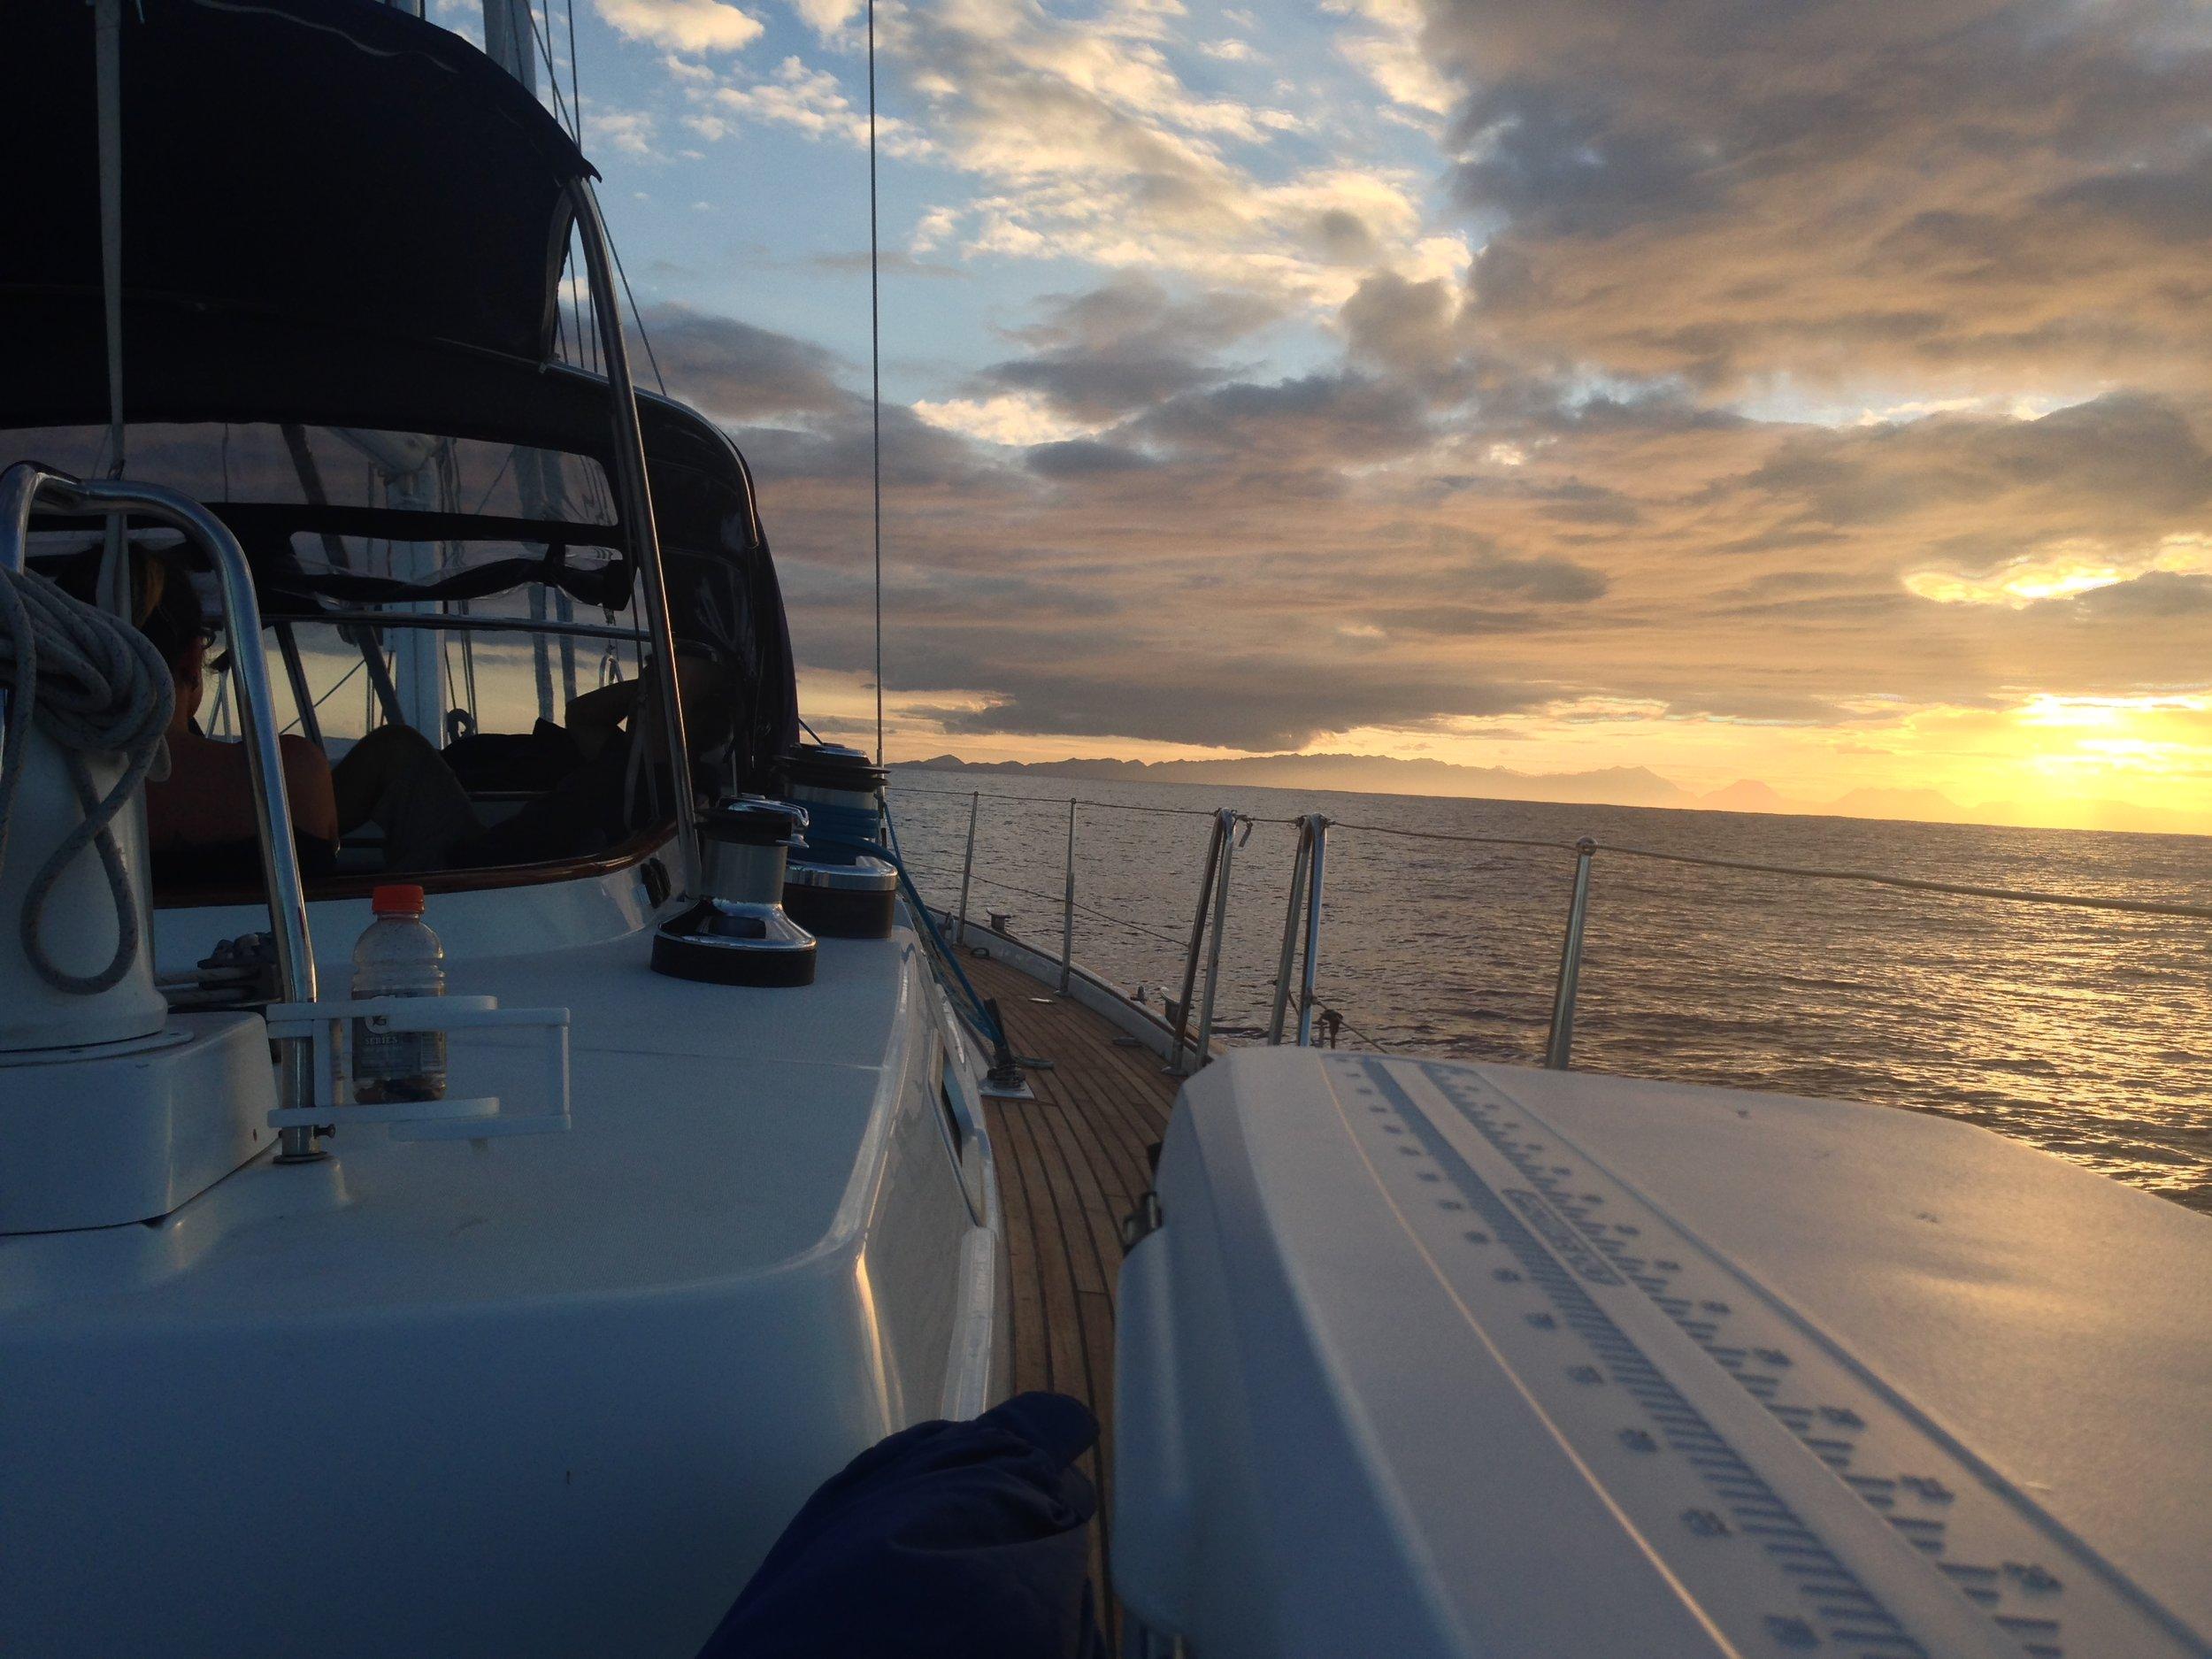 sunset off east oahu.JPG